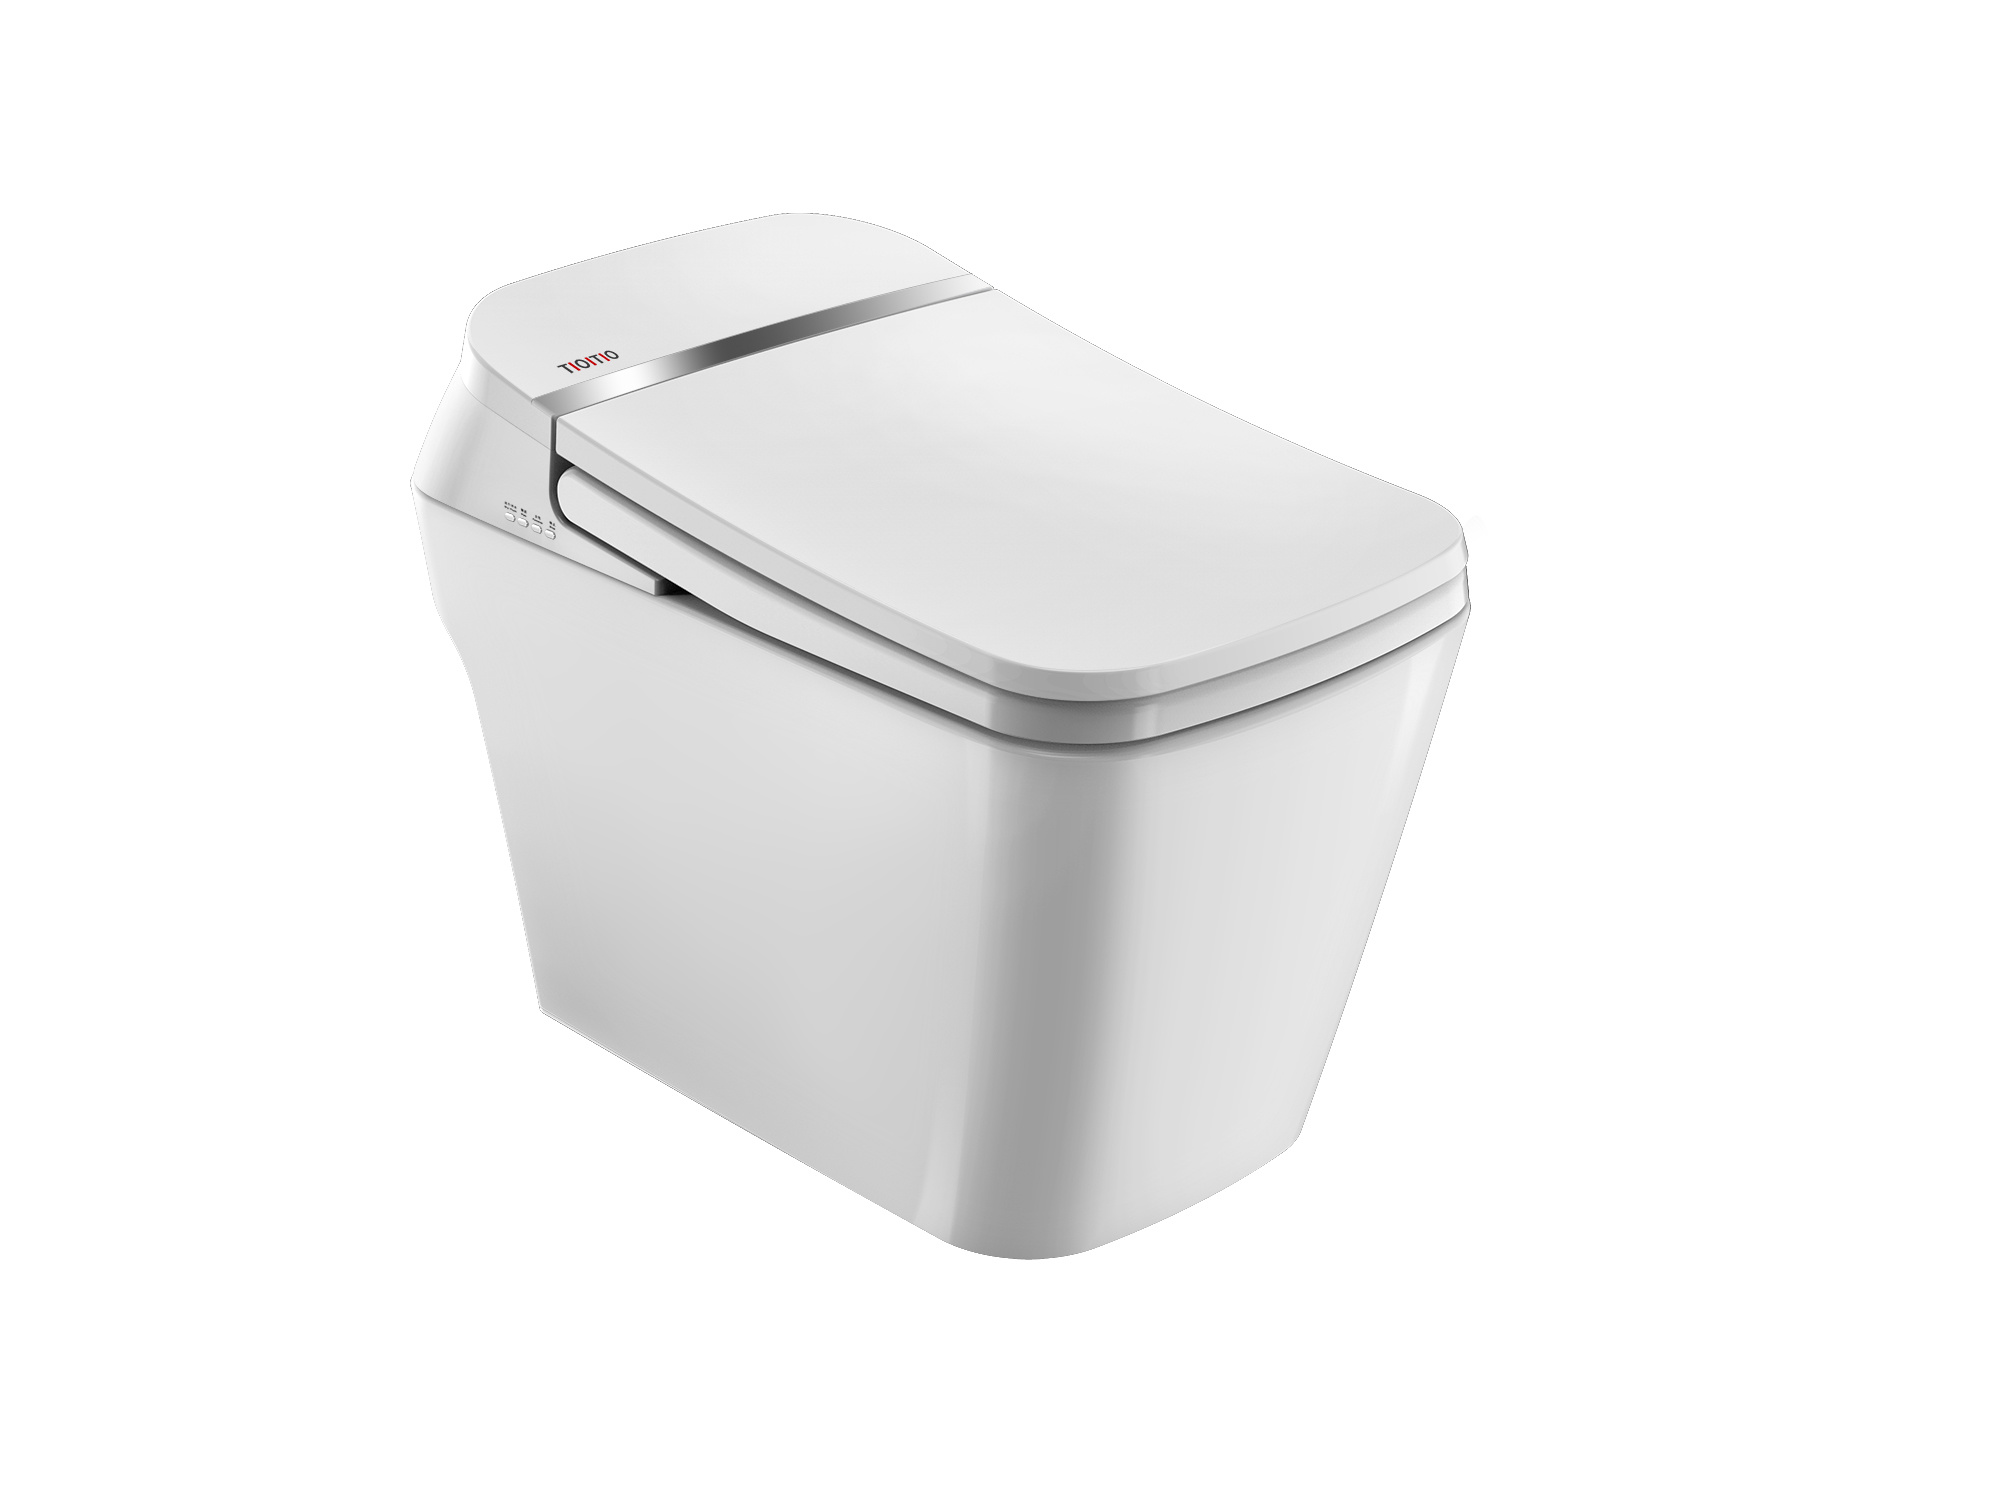 Miraculous Hot Item Elegant Style Auto Deodorizer Ceramic Chinese Cheap Smart Pedestal Squat Toilet Machost Co Dining Chair Design Ideas Machostcouk